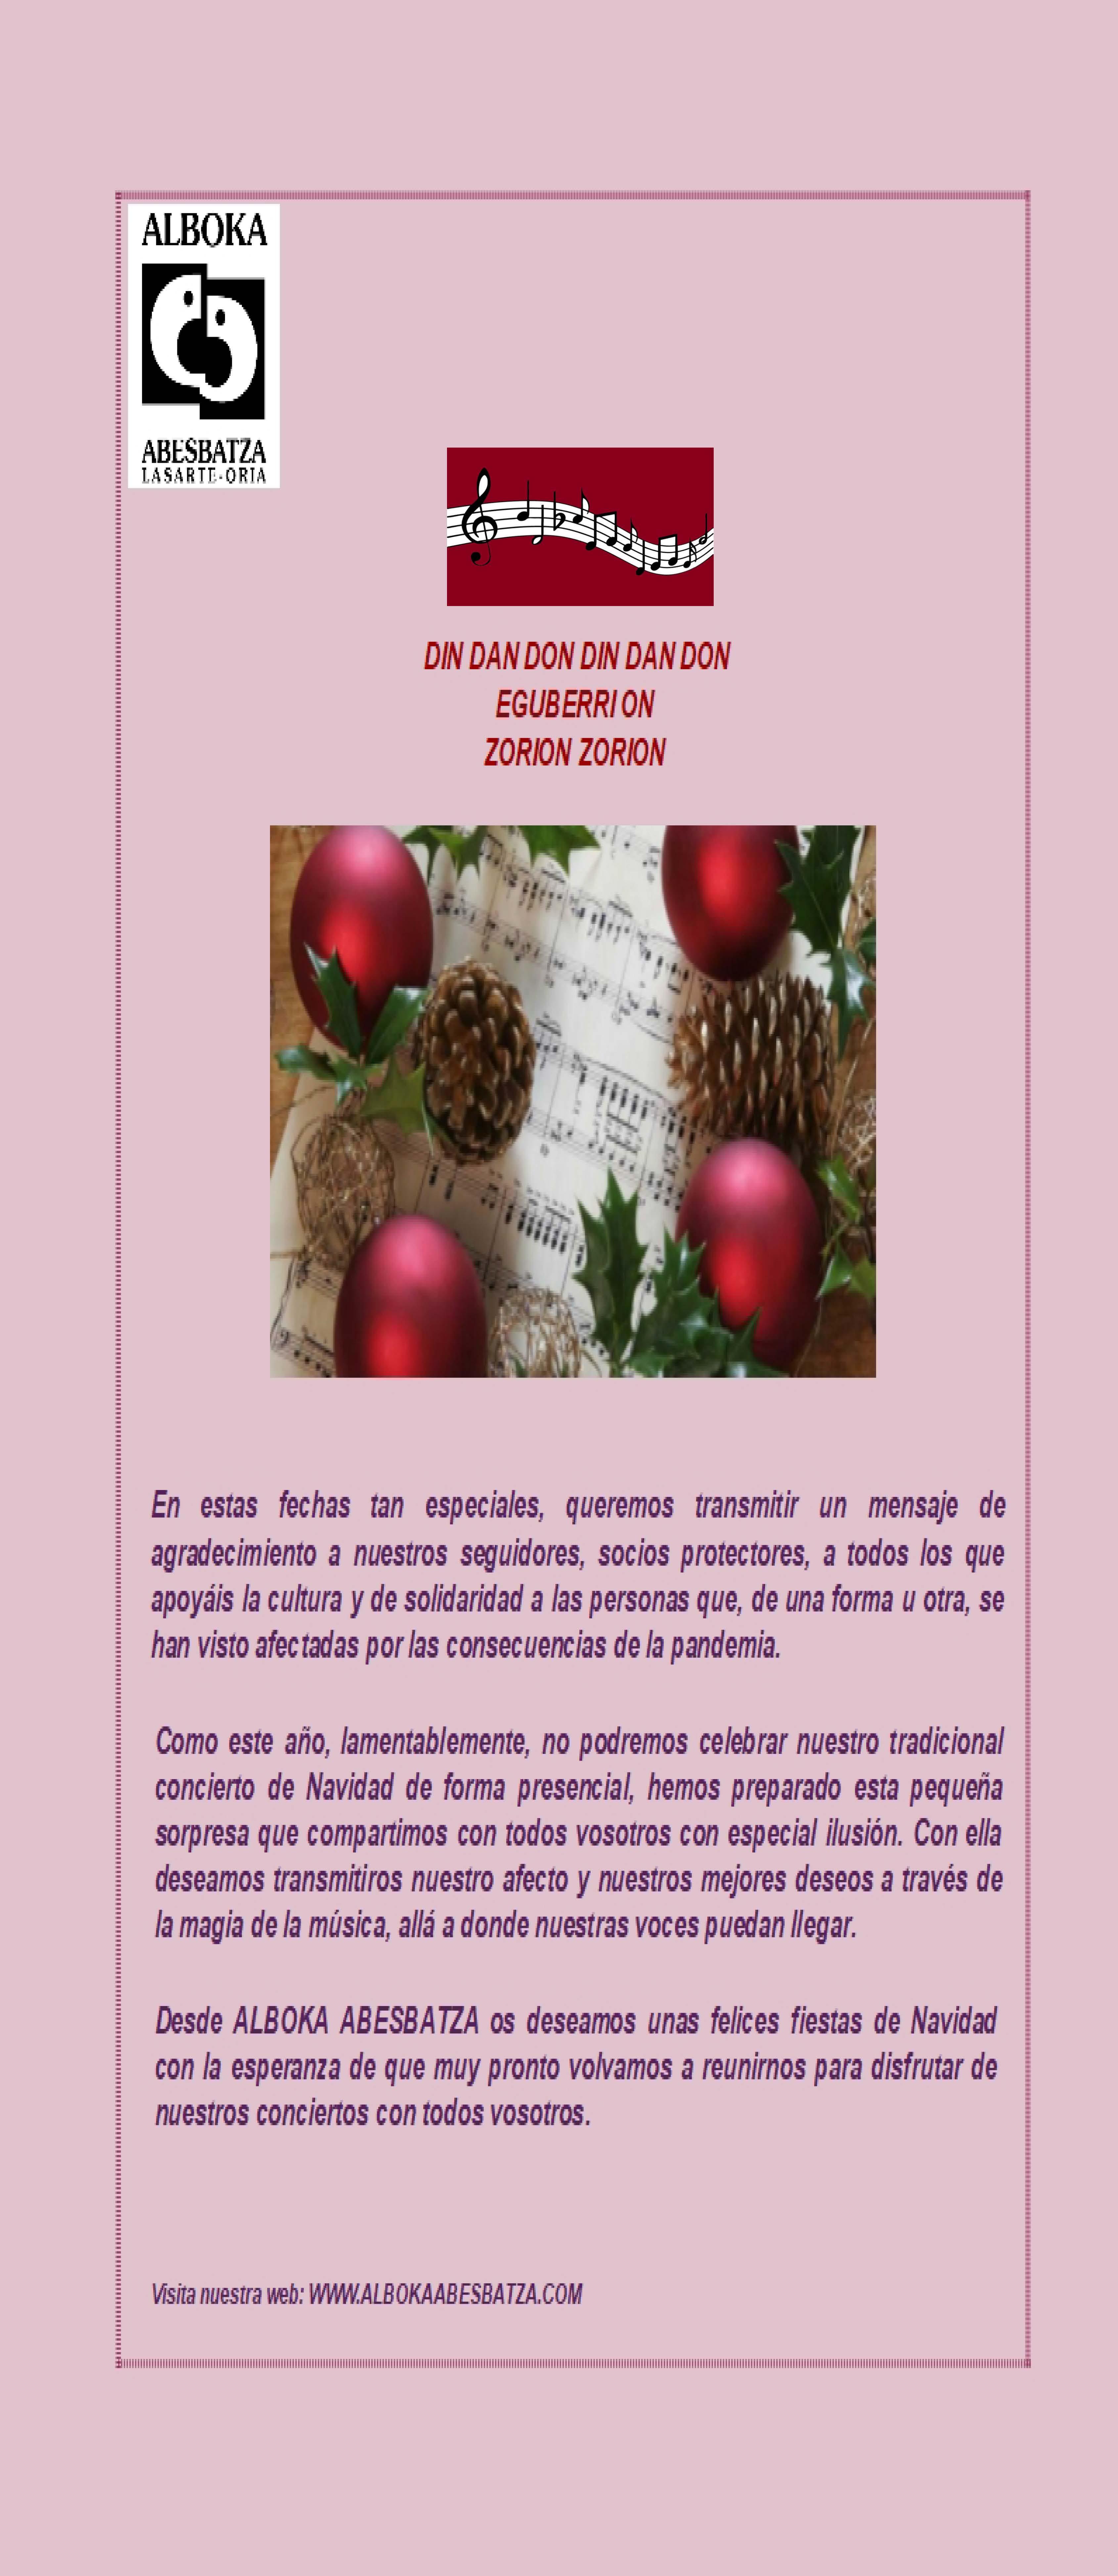 Alboka Navidad 2020 castellano